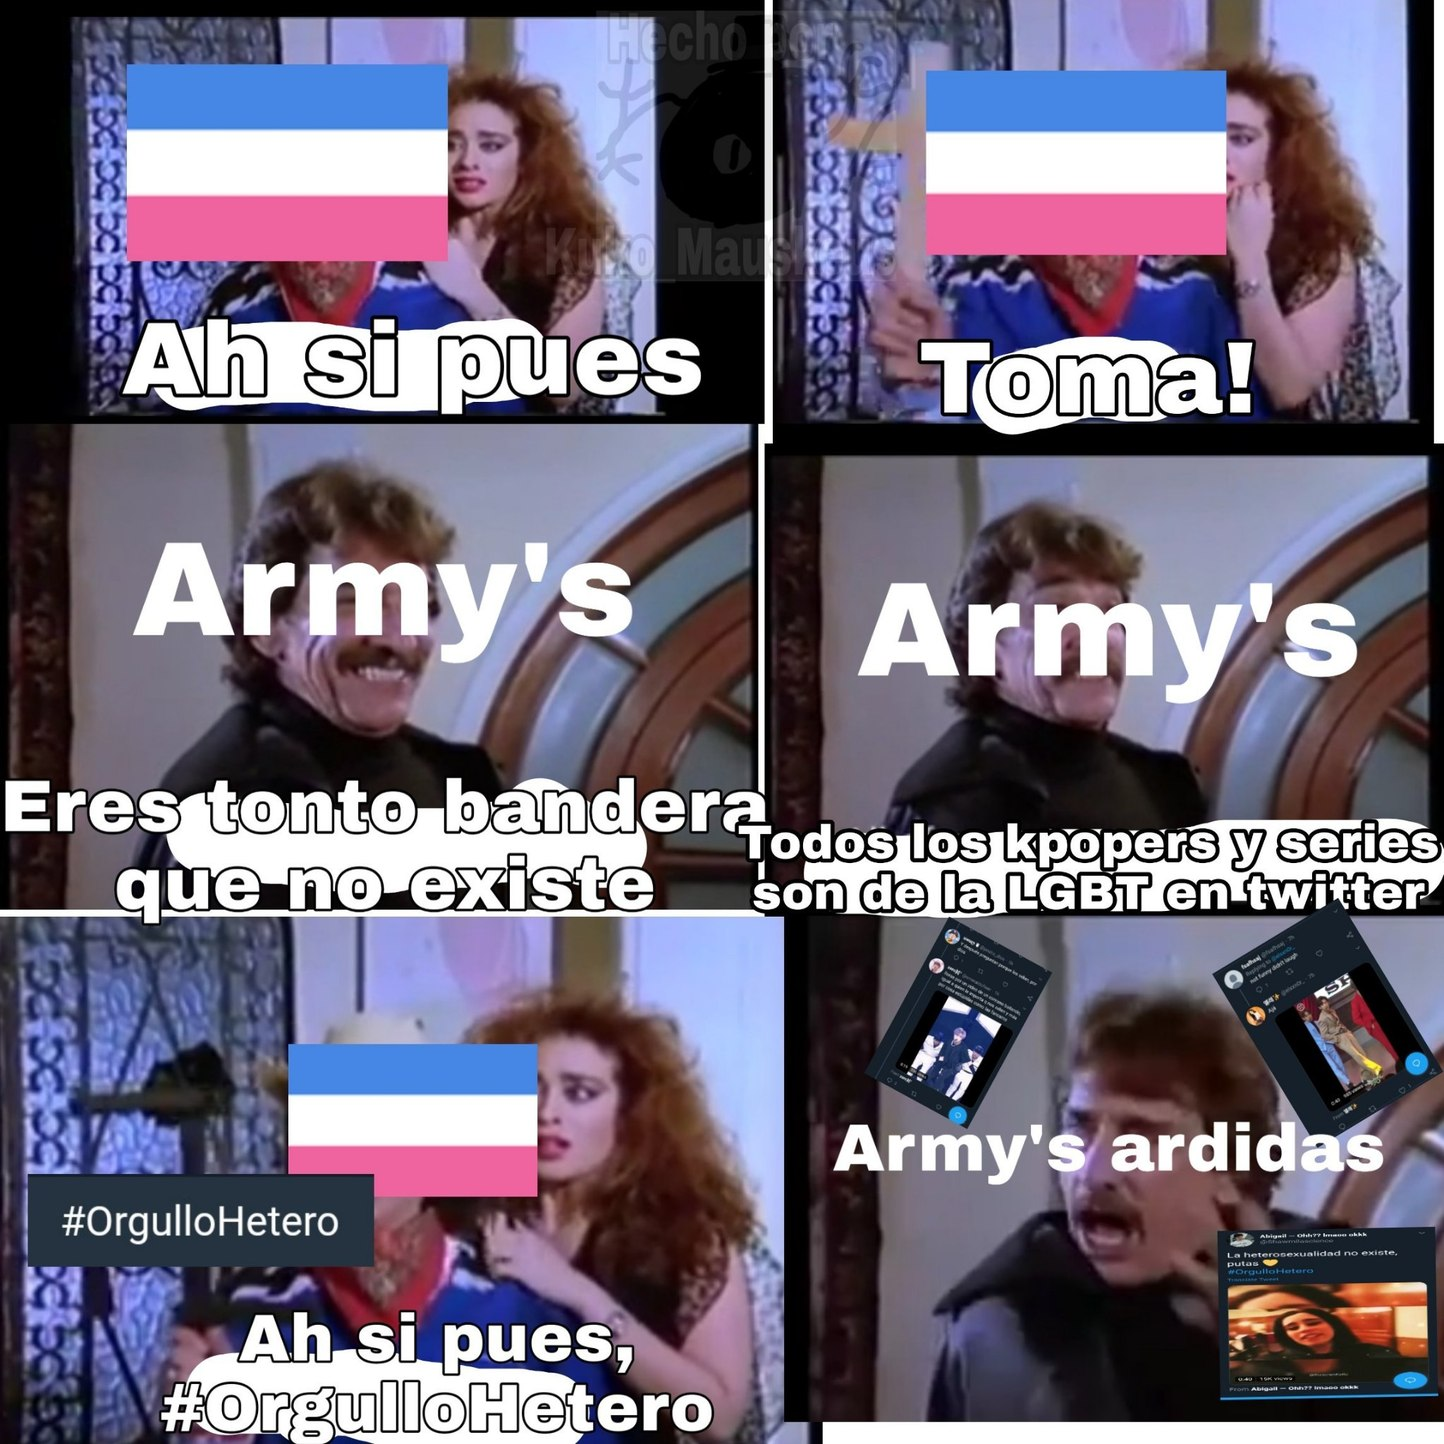 Malditas army's arruinaron el Orgullo Hetero - meme